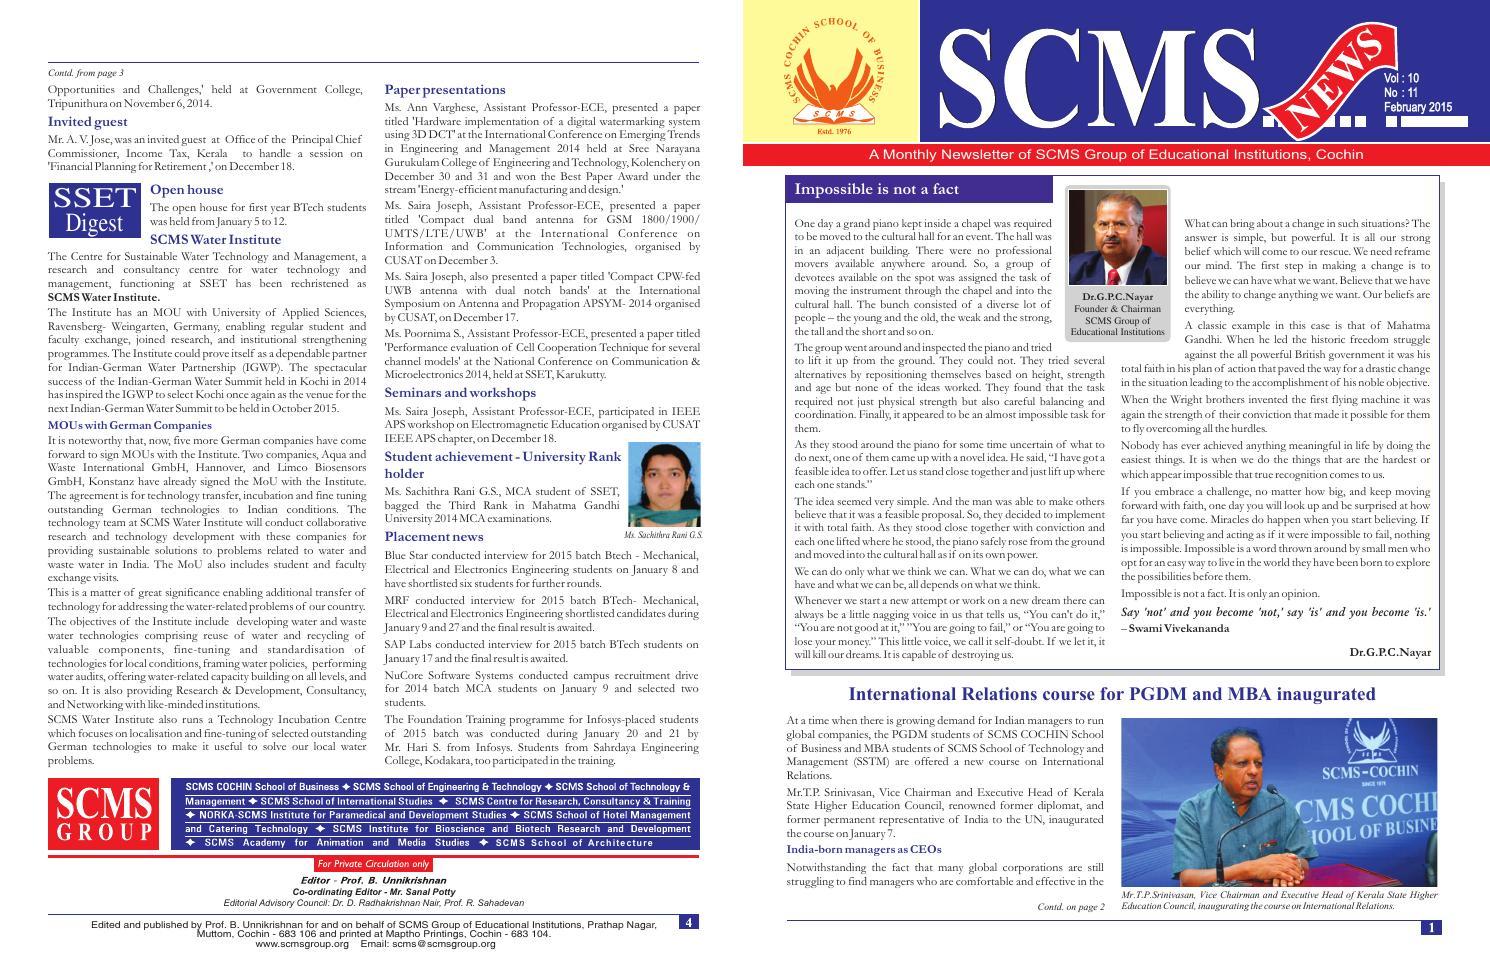 Scms news feb 2015 by SCMS Cochin School of Business - issuu